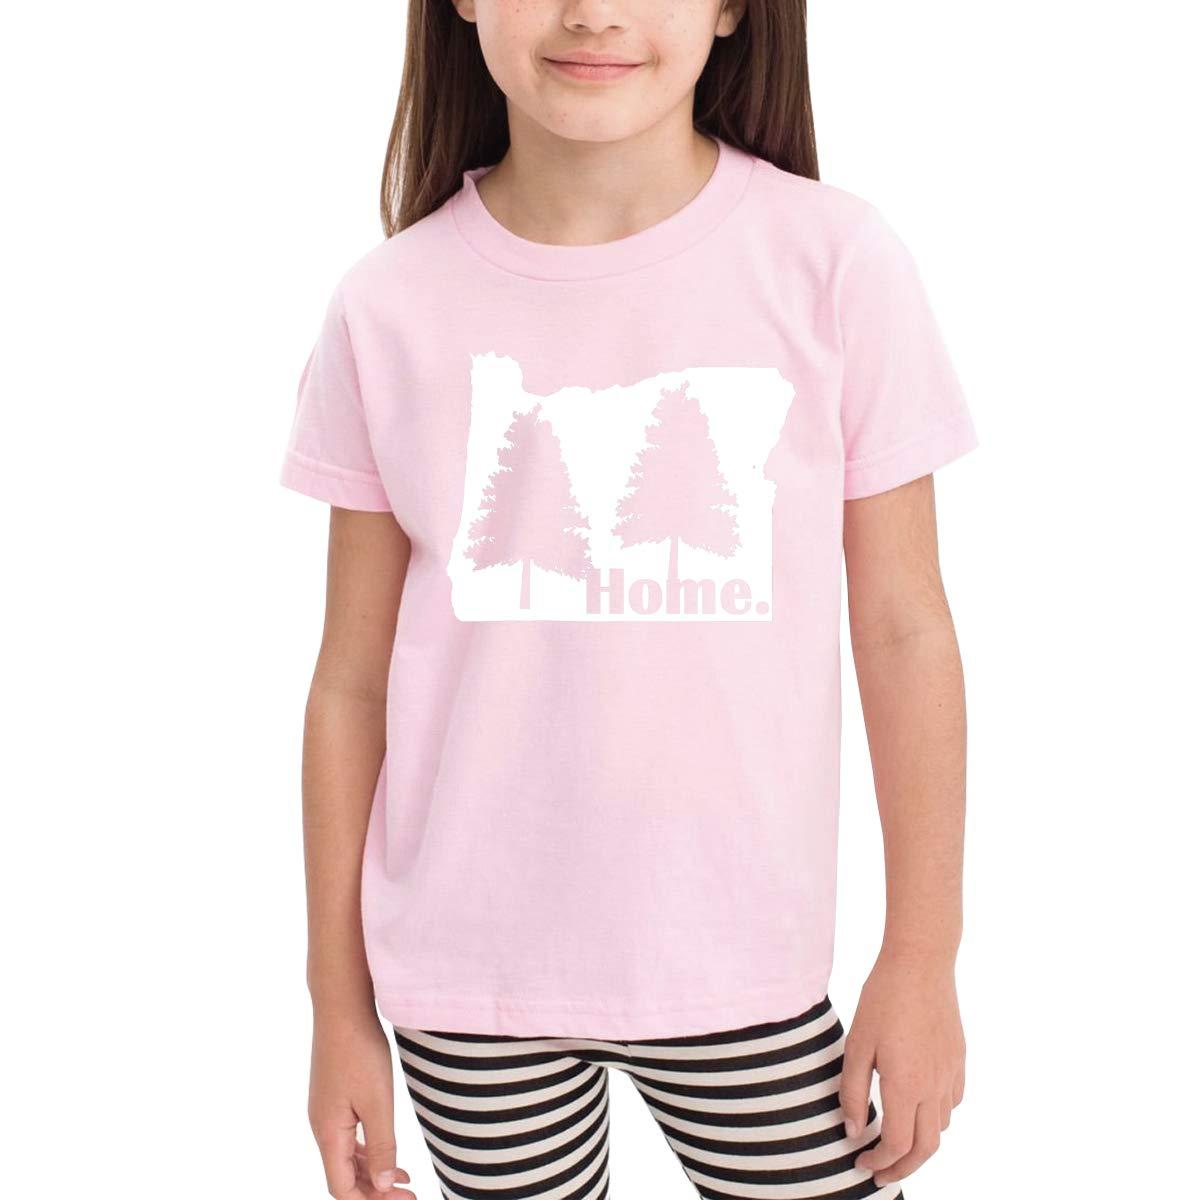 Kids T-Shirt Tops Black Oregon Pine Trees Home Unisex Youths Short Sleeve T-Shirt